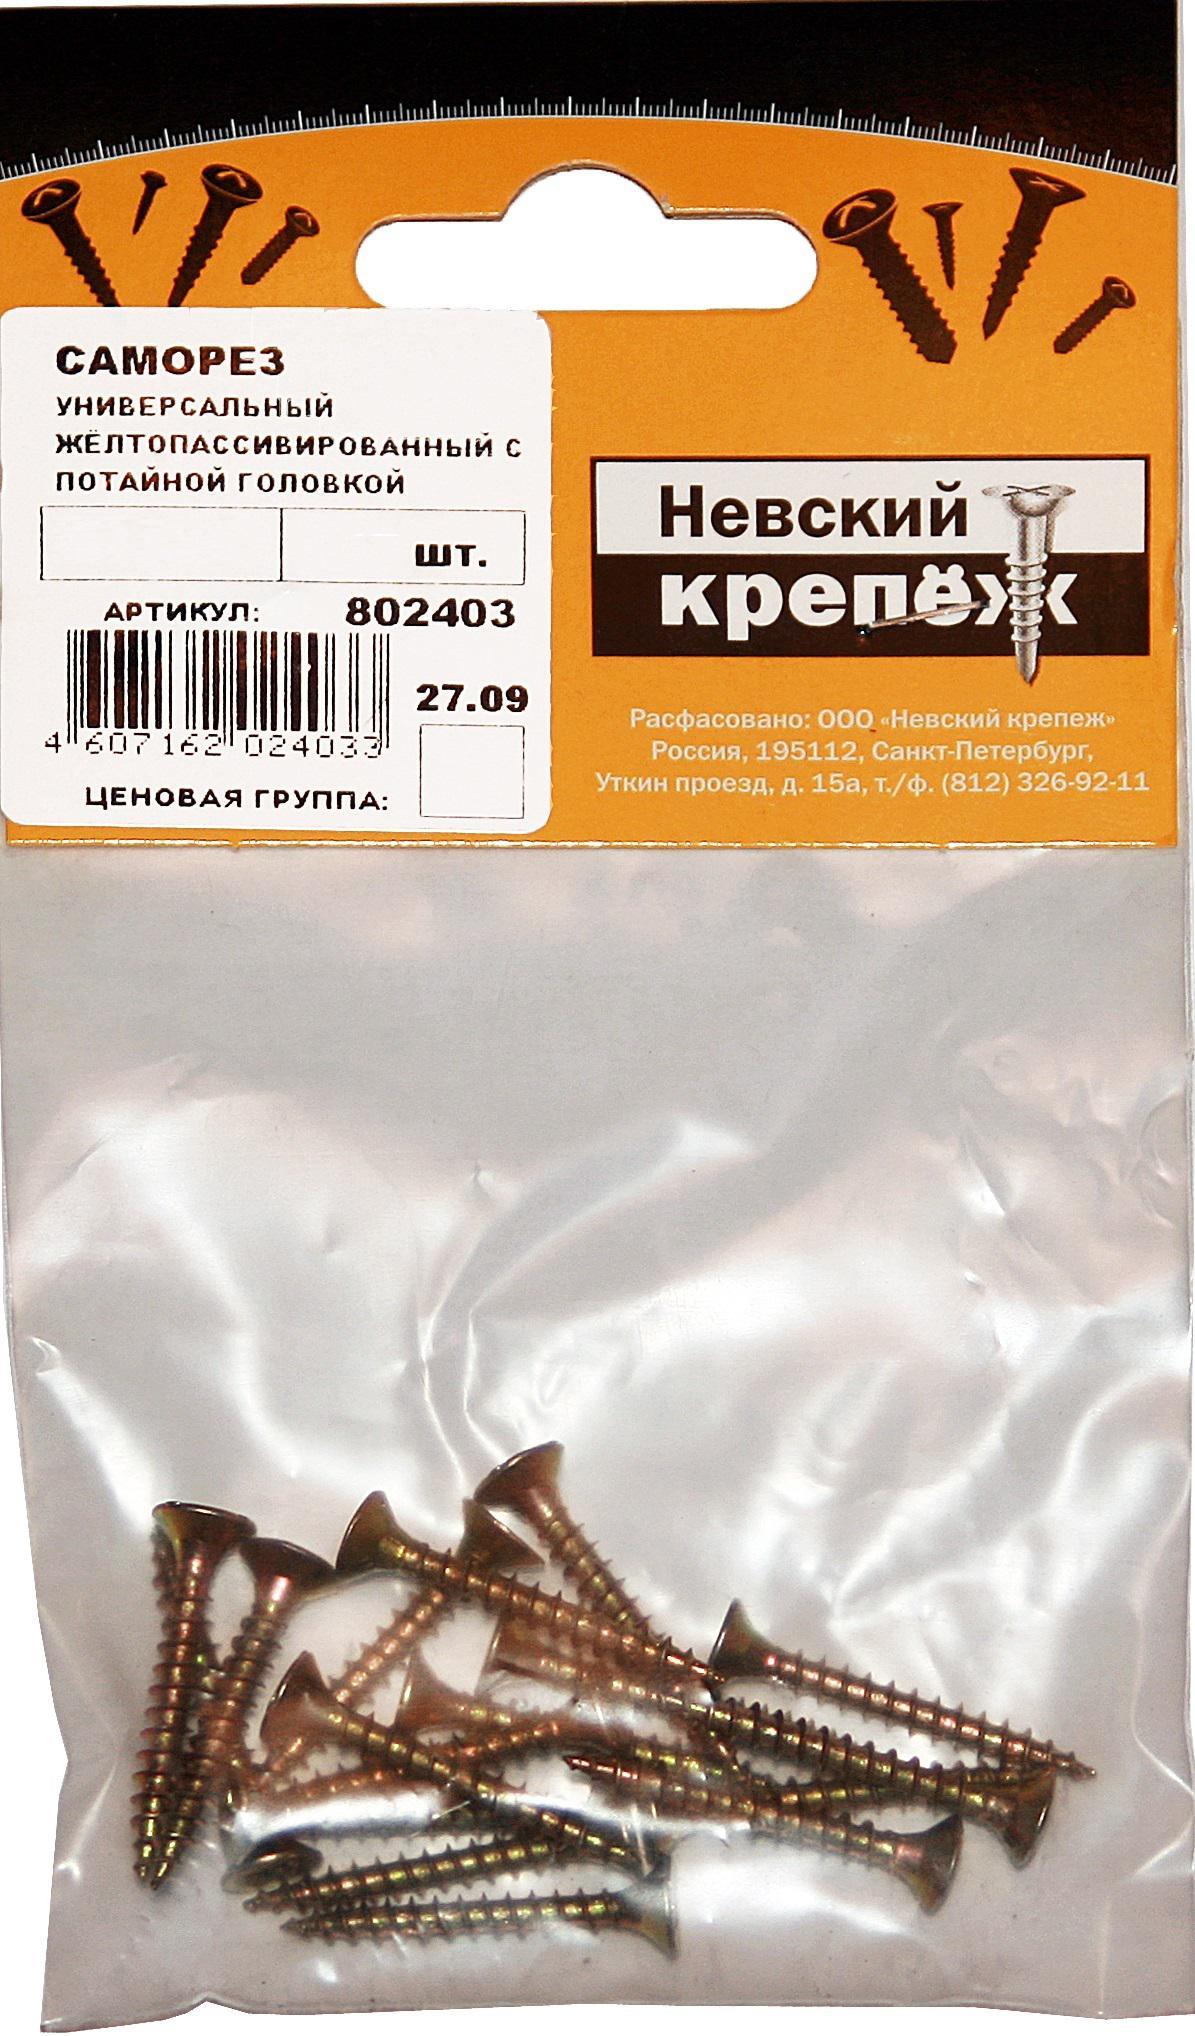 Саморез НЕВСКИЙ КРЕПЕЖ 802387